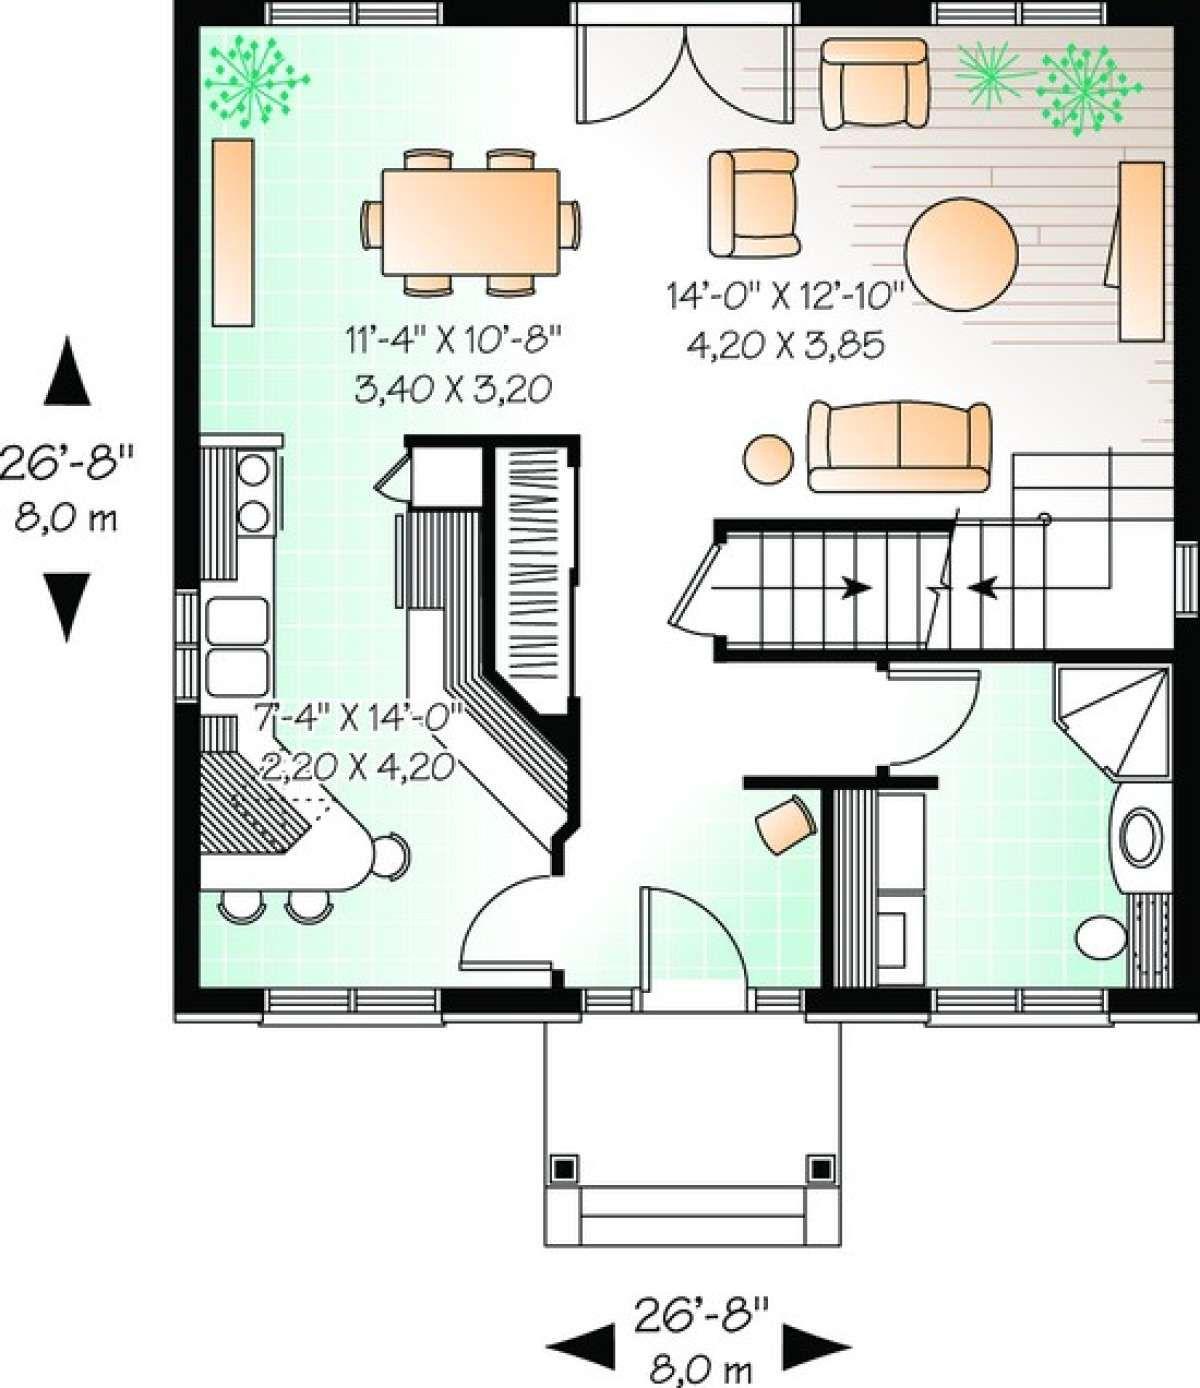 House Plan 034 00928 European Plan 1 422 Square Feet 3 Bedrooms 2 Bathrooms In 2021 Colonial House Plans House Plans 20x30 House Plans